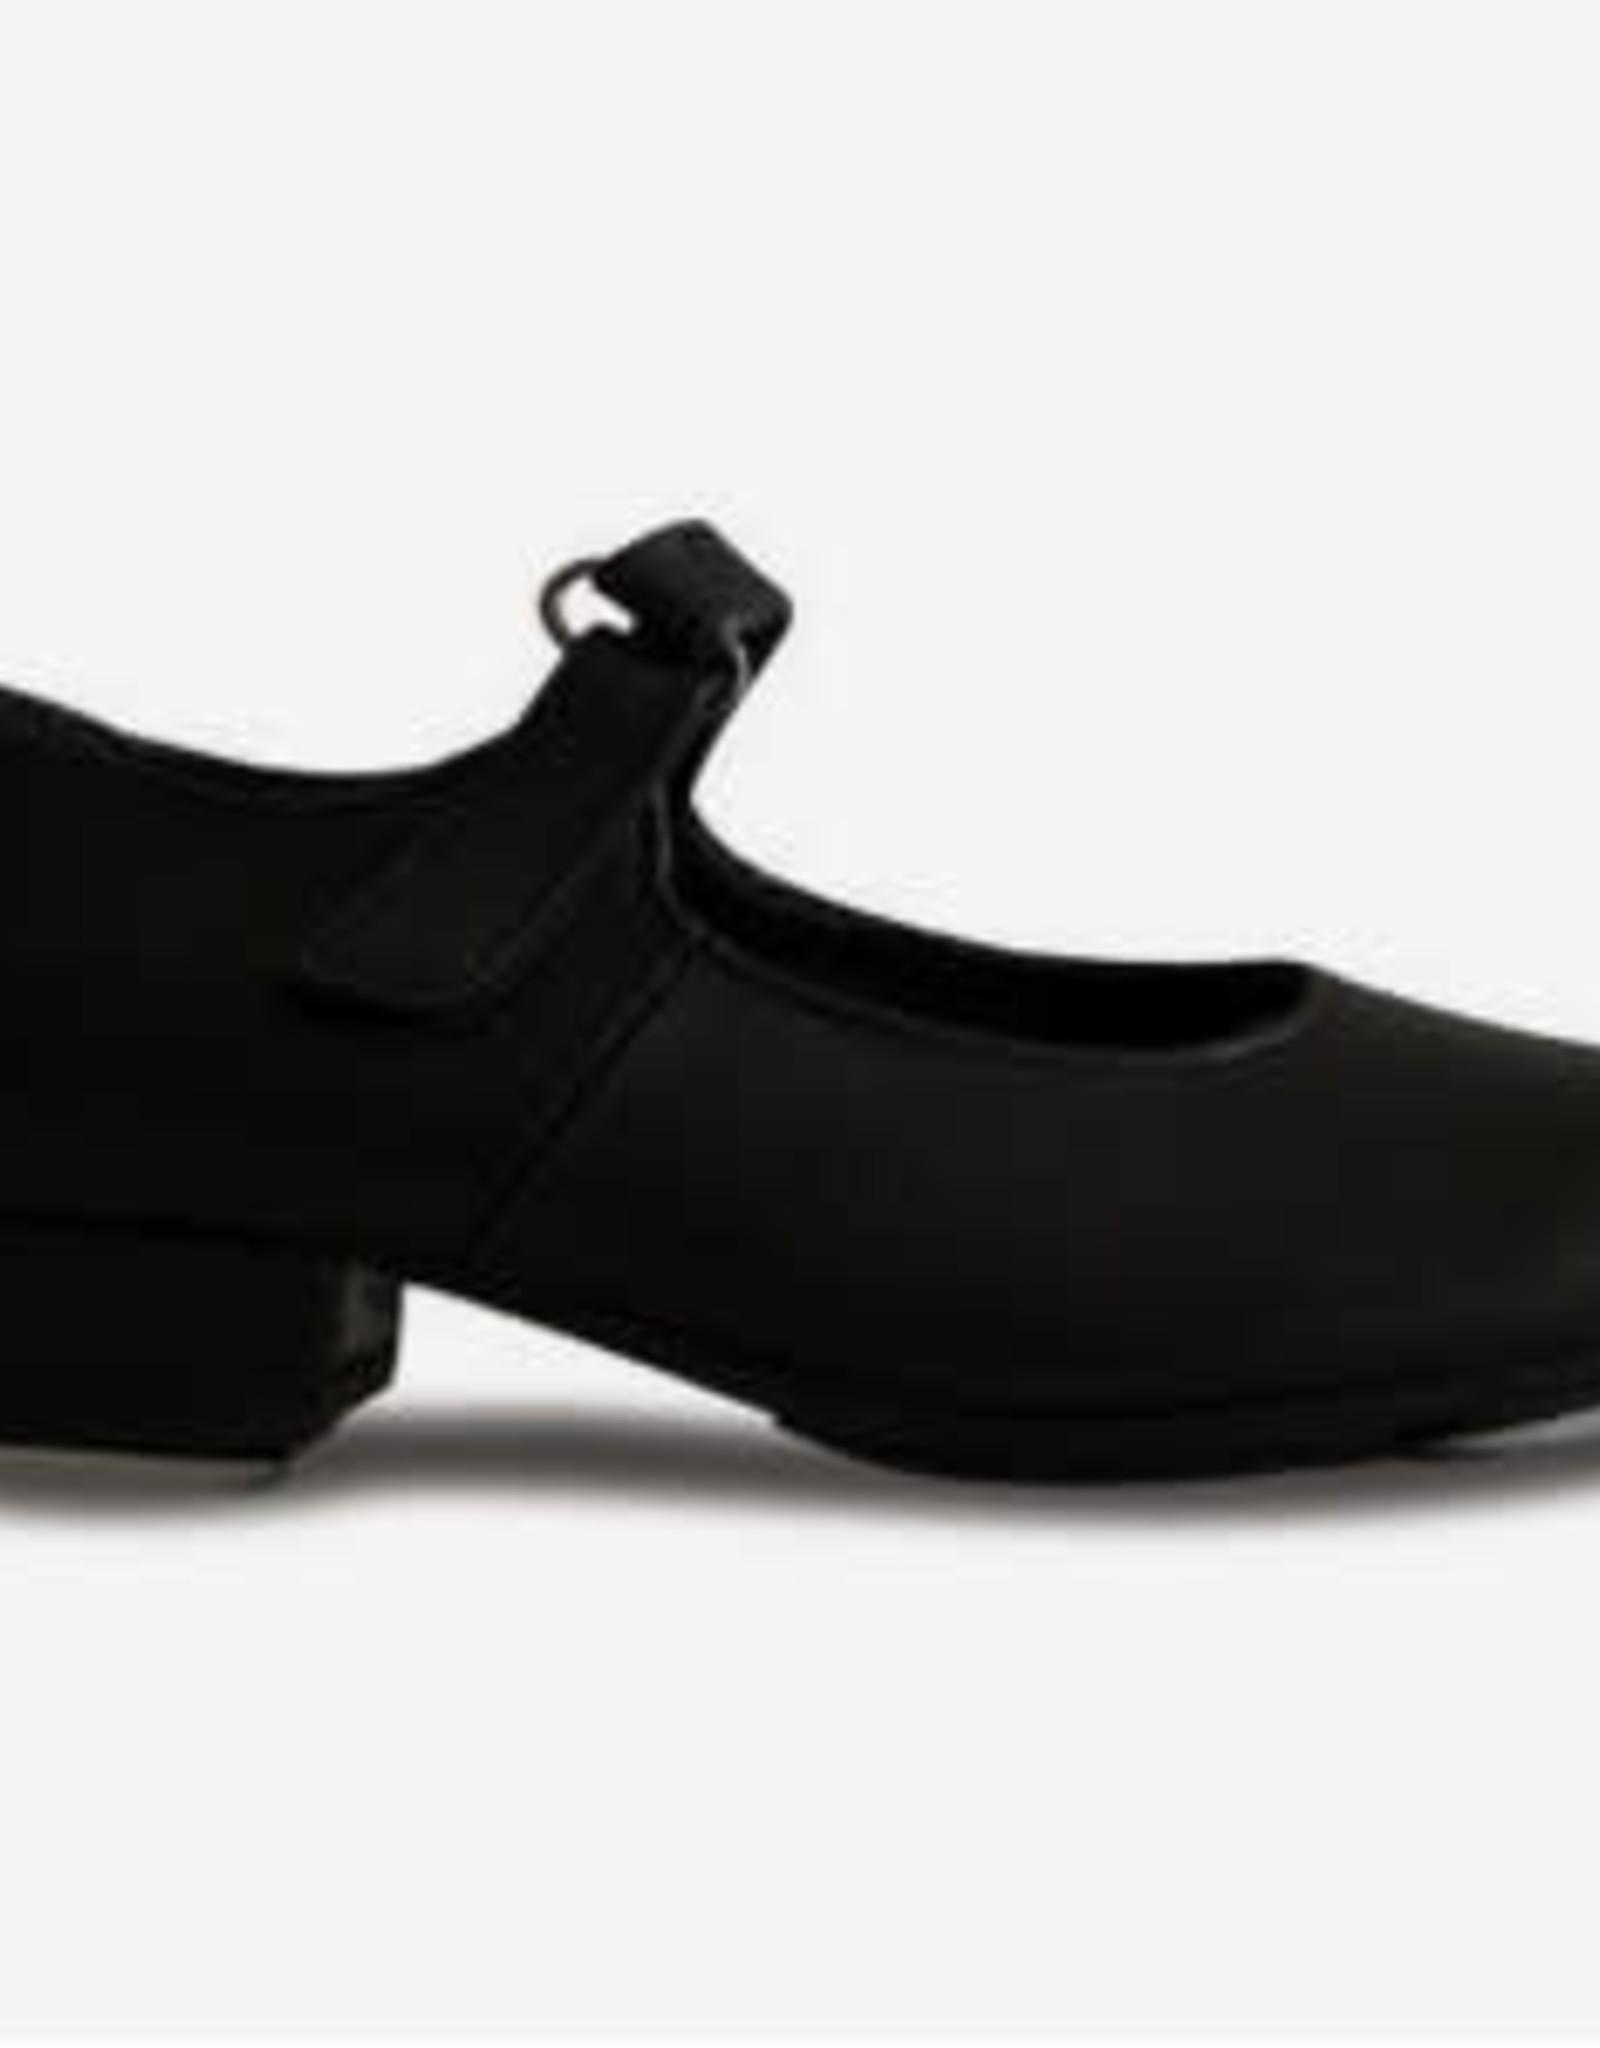 Radadancewear Sansha SOULIERS CLAQUETTE JR TEE-SOFIETTE NOIR